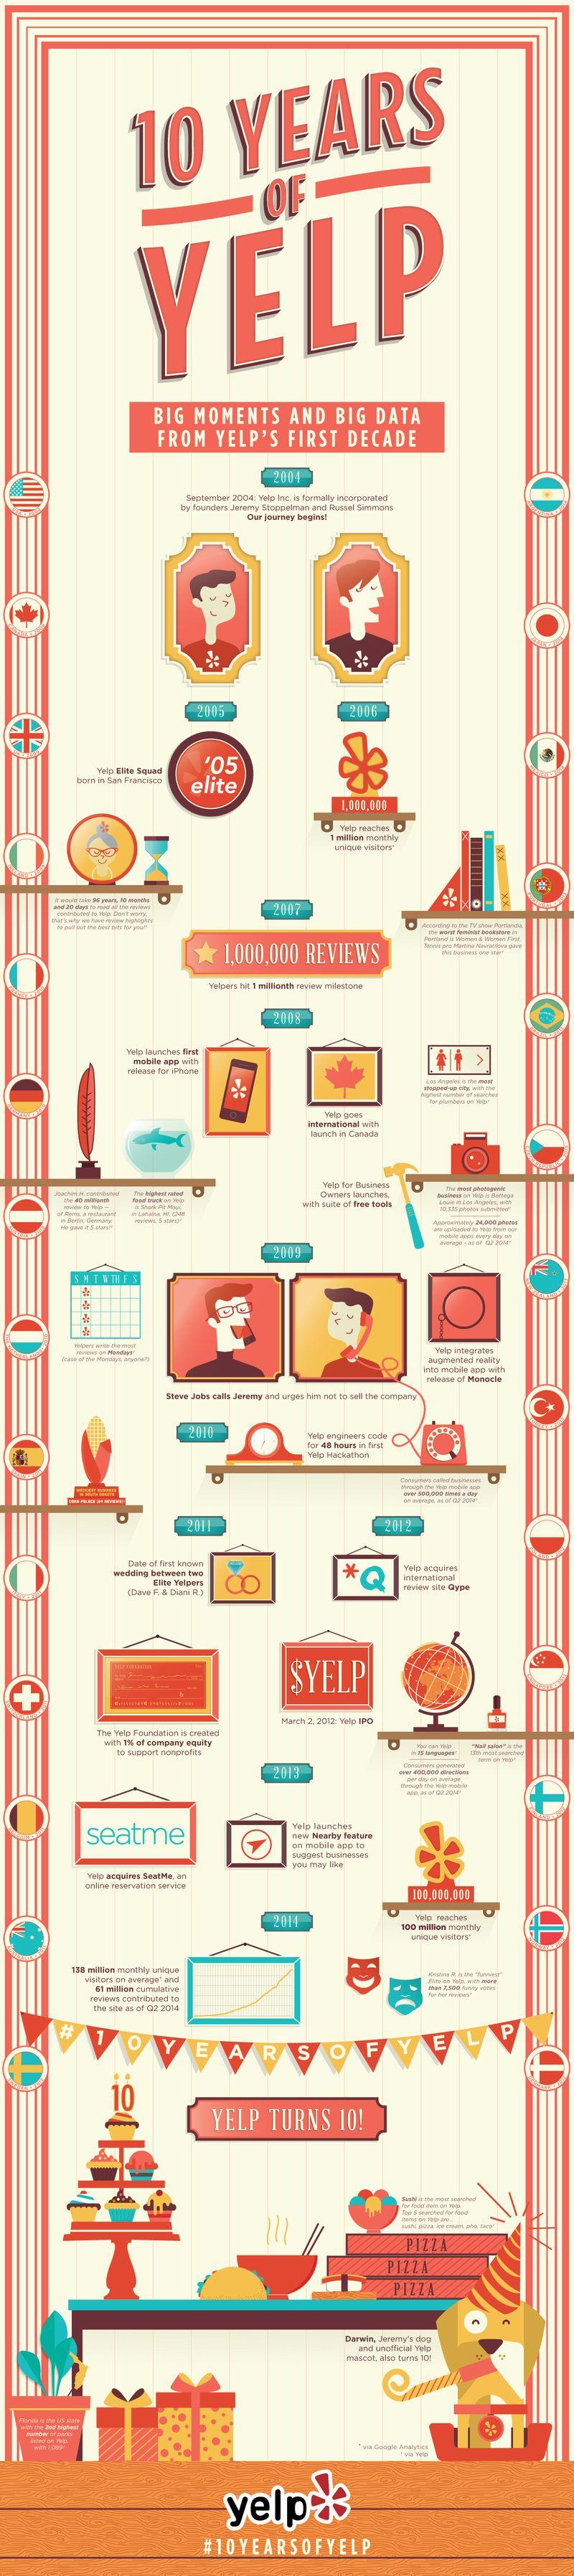 10 years of YELP infographic